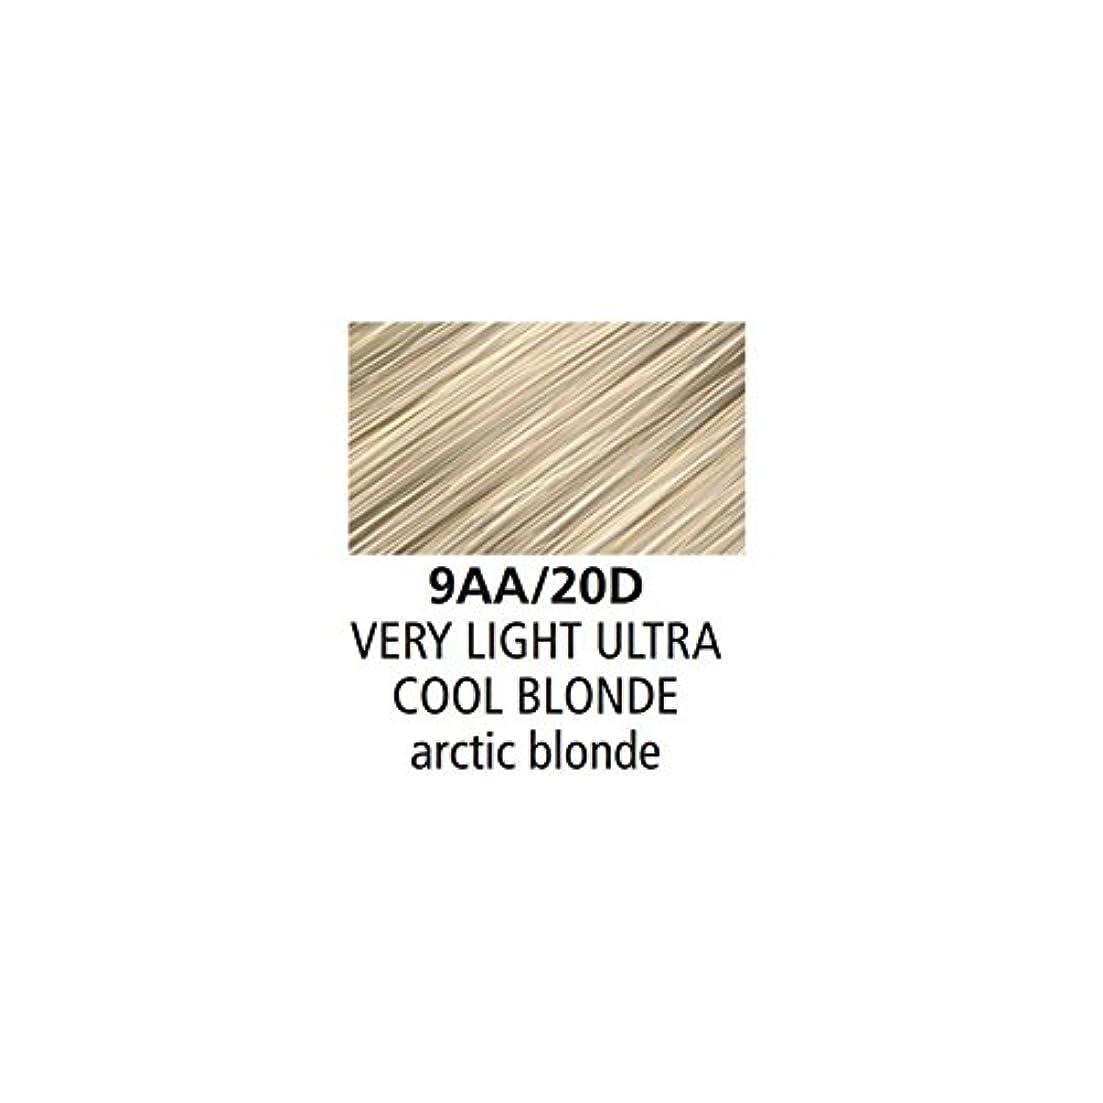 側面救急車髄Clairol Professional - SOY4PLEX - Liquicolor Permanente - Very Light Ultra Cool Blonde - 9AA/20D - 2 oz / 59 mL